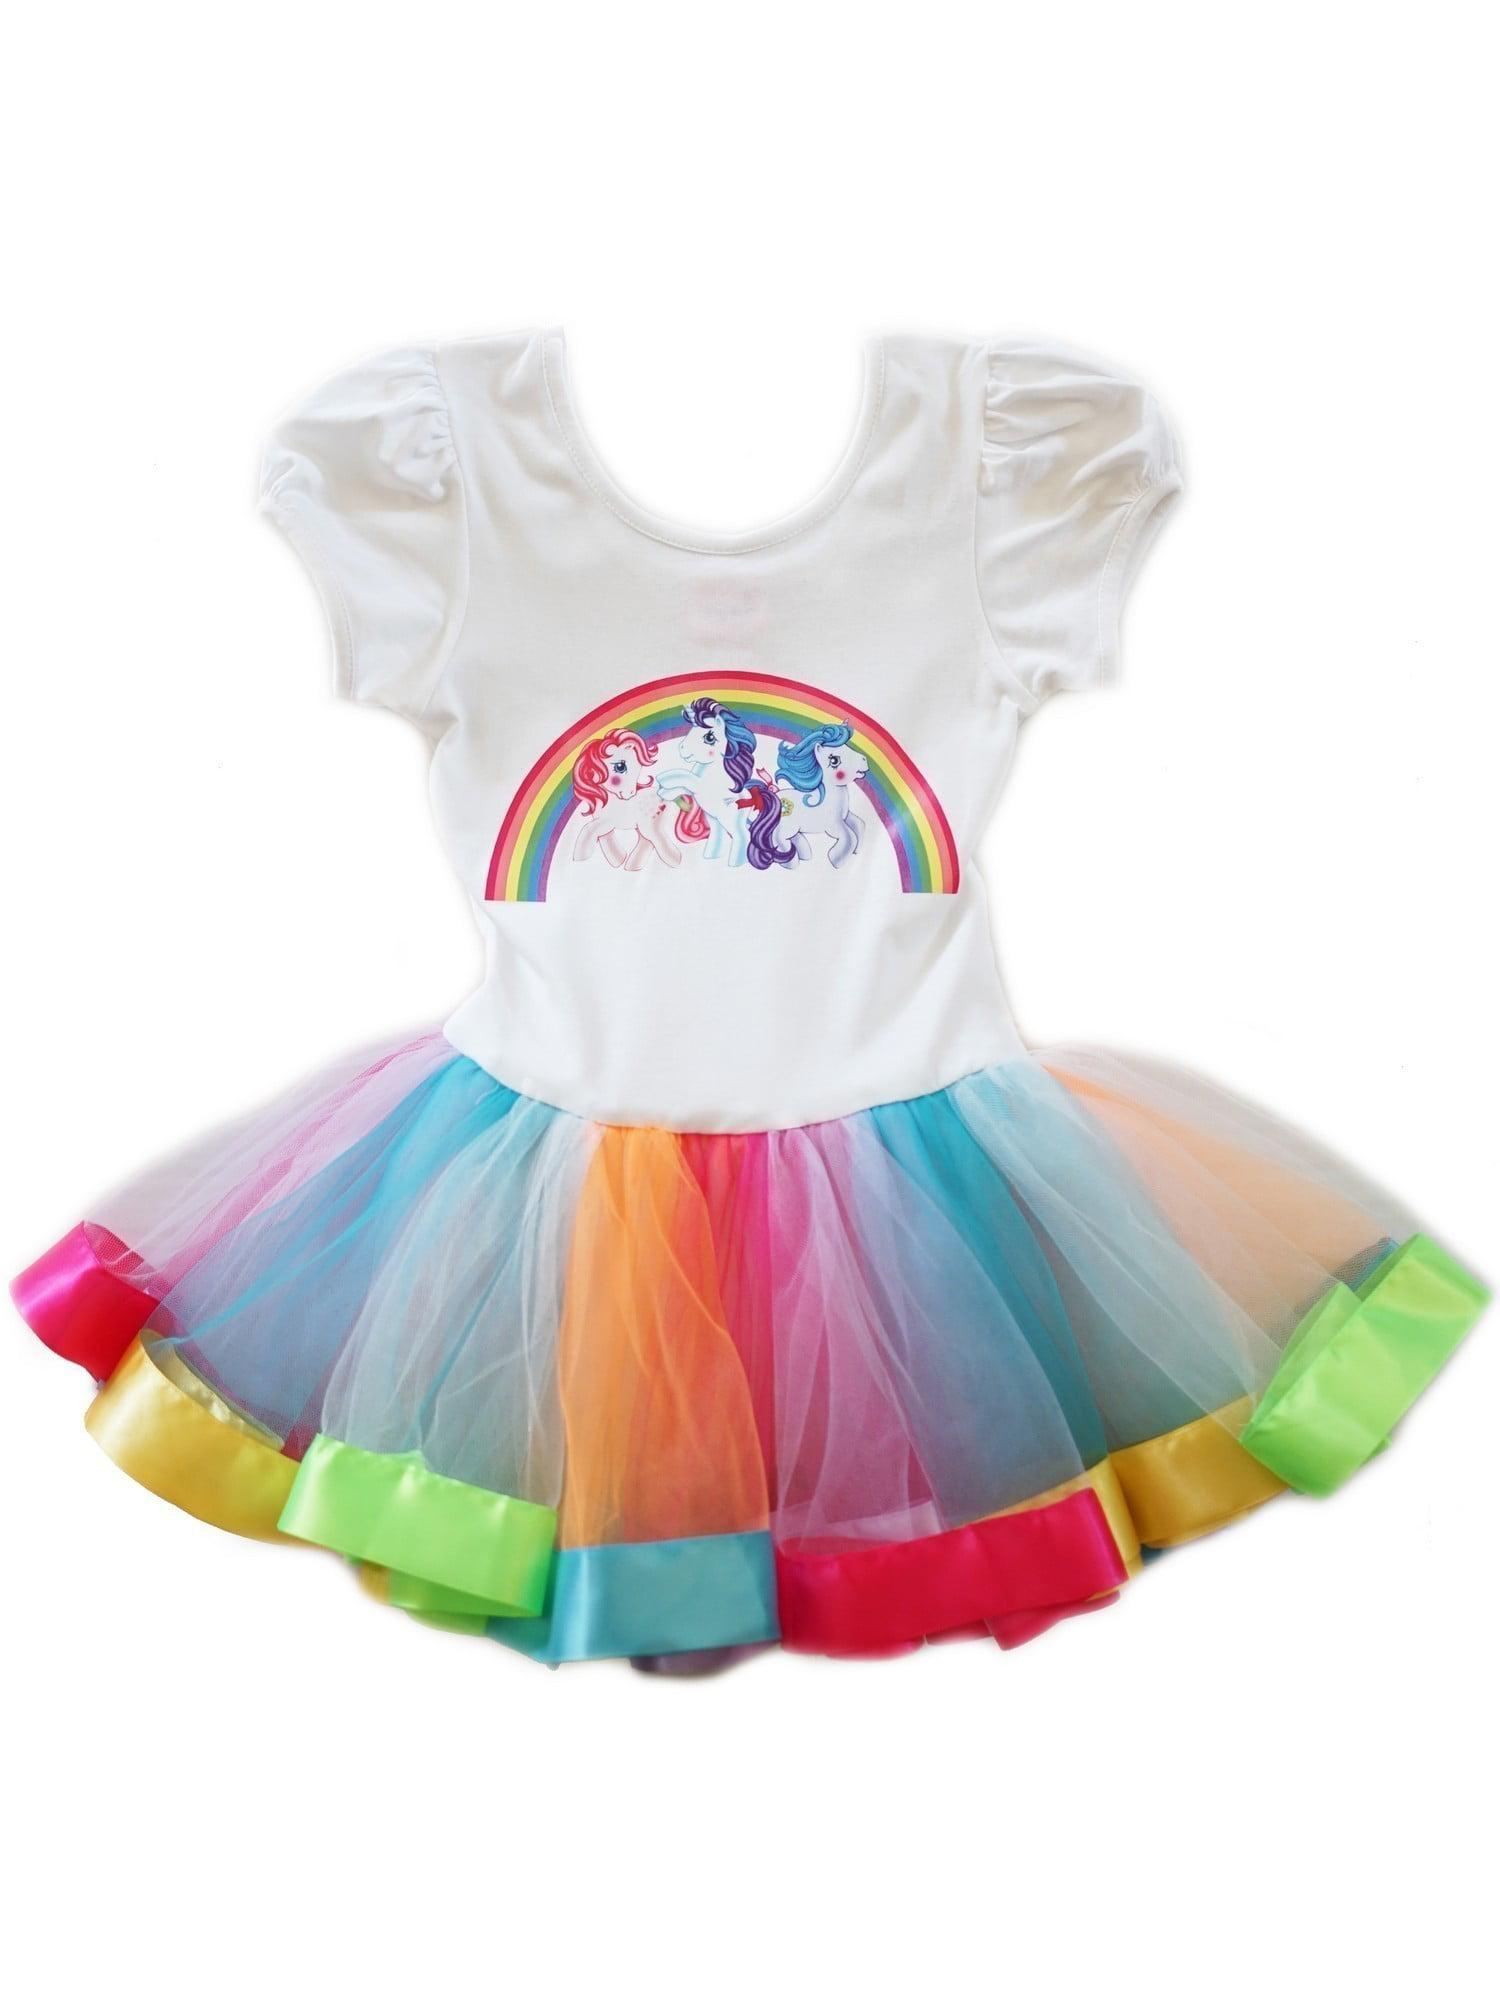 Personalized My Little Pony Pinkie Pie Birthday tutu outfit 6//9 yrs